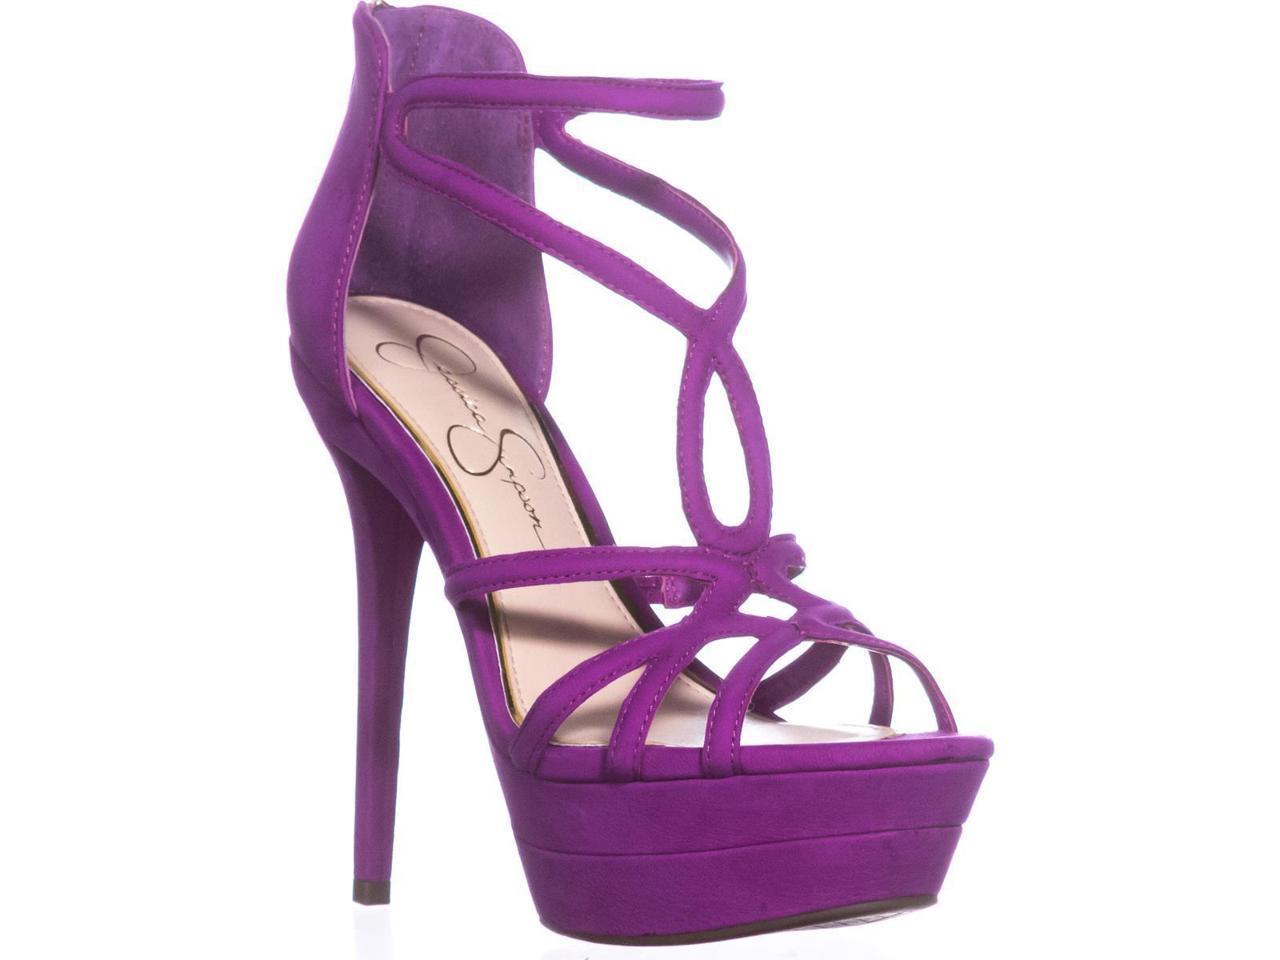 Jessica Simpson Rozmari Rozmari Rozmari Platform Evening Sandals, Vivid Orchid, 5.5 US 07eee0